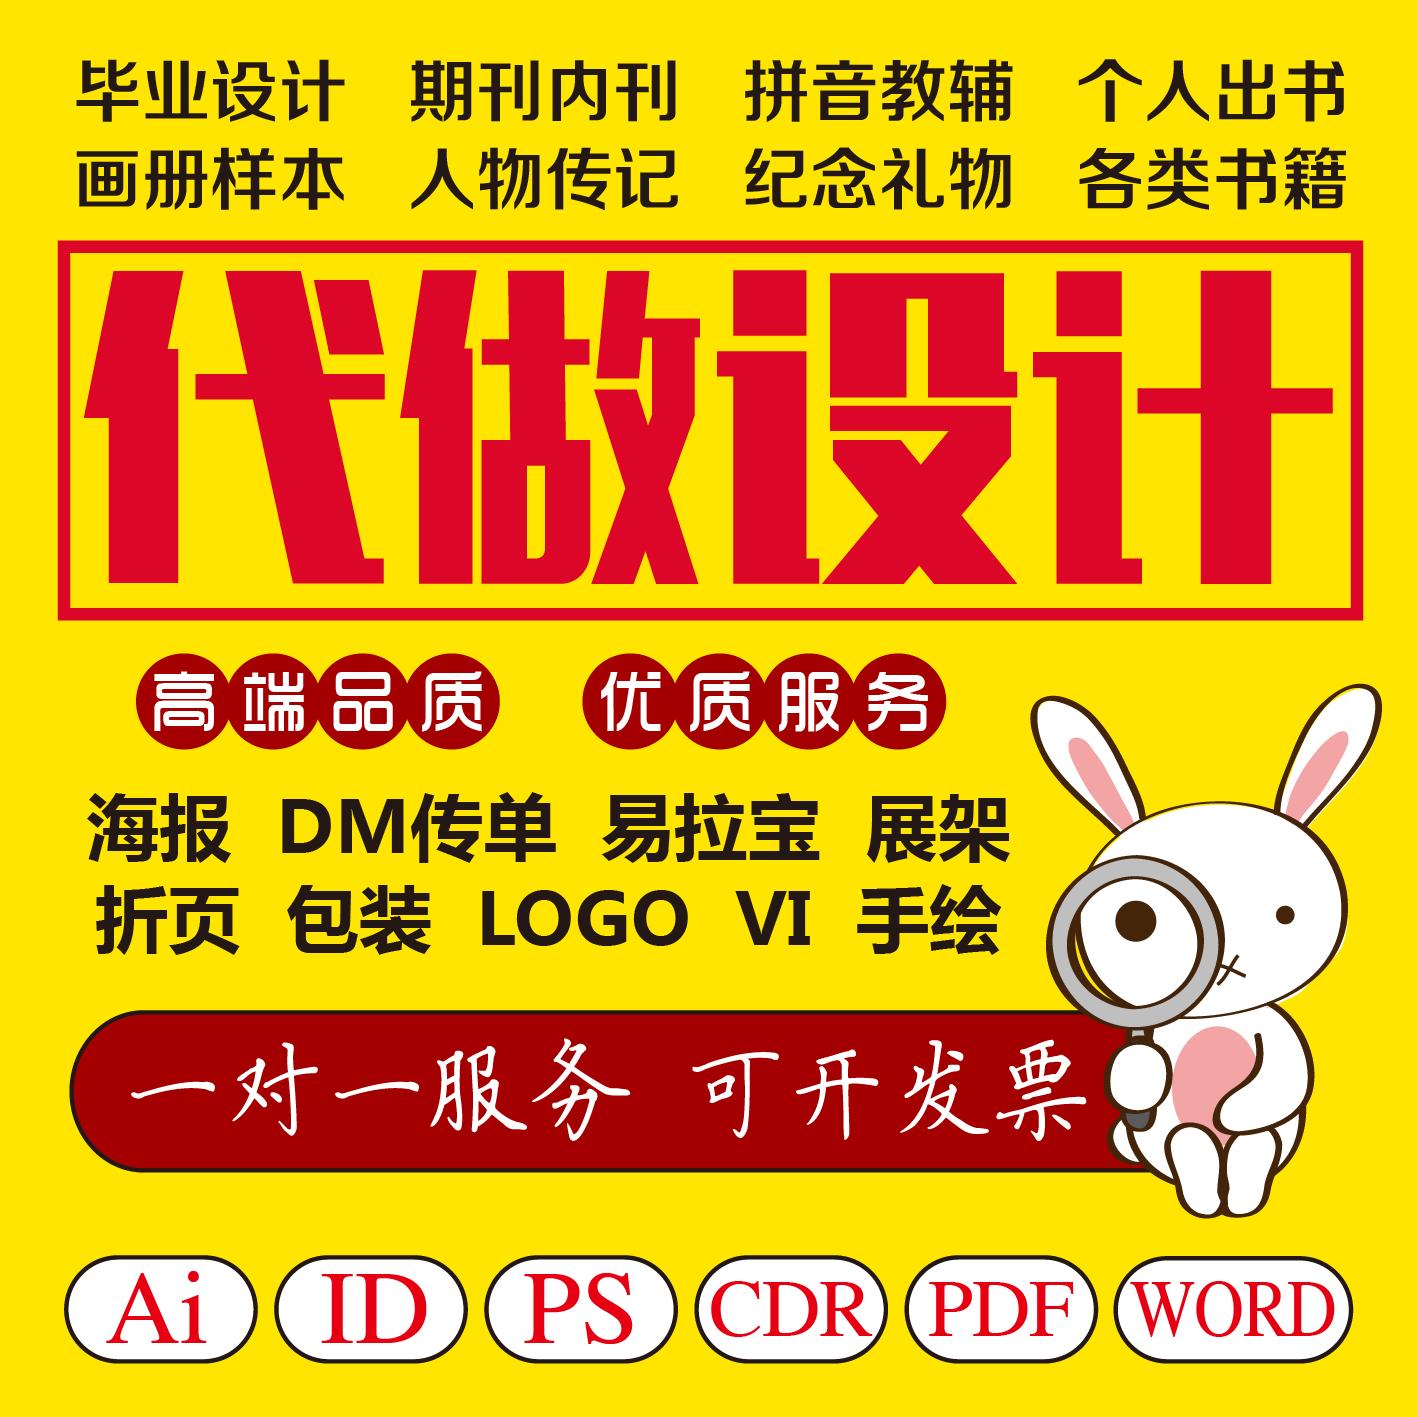 ID排版设计公司学校企业单位报纸内刊期刊书籍教科书教案杂志画册